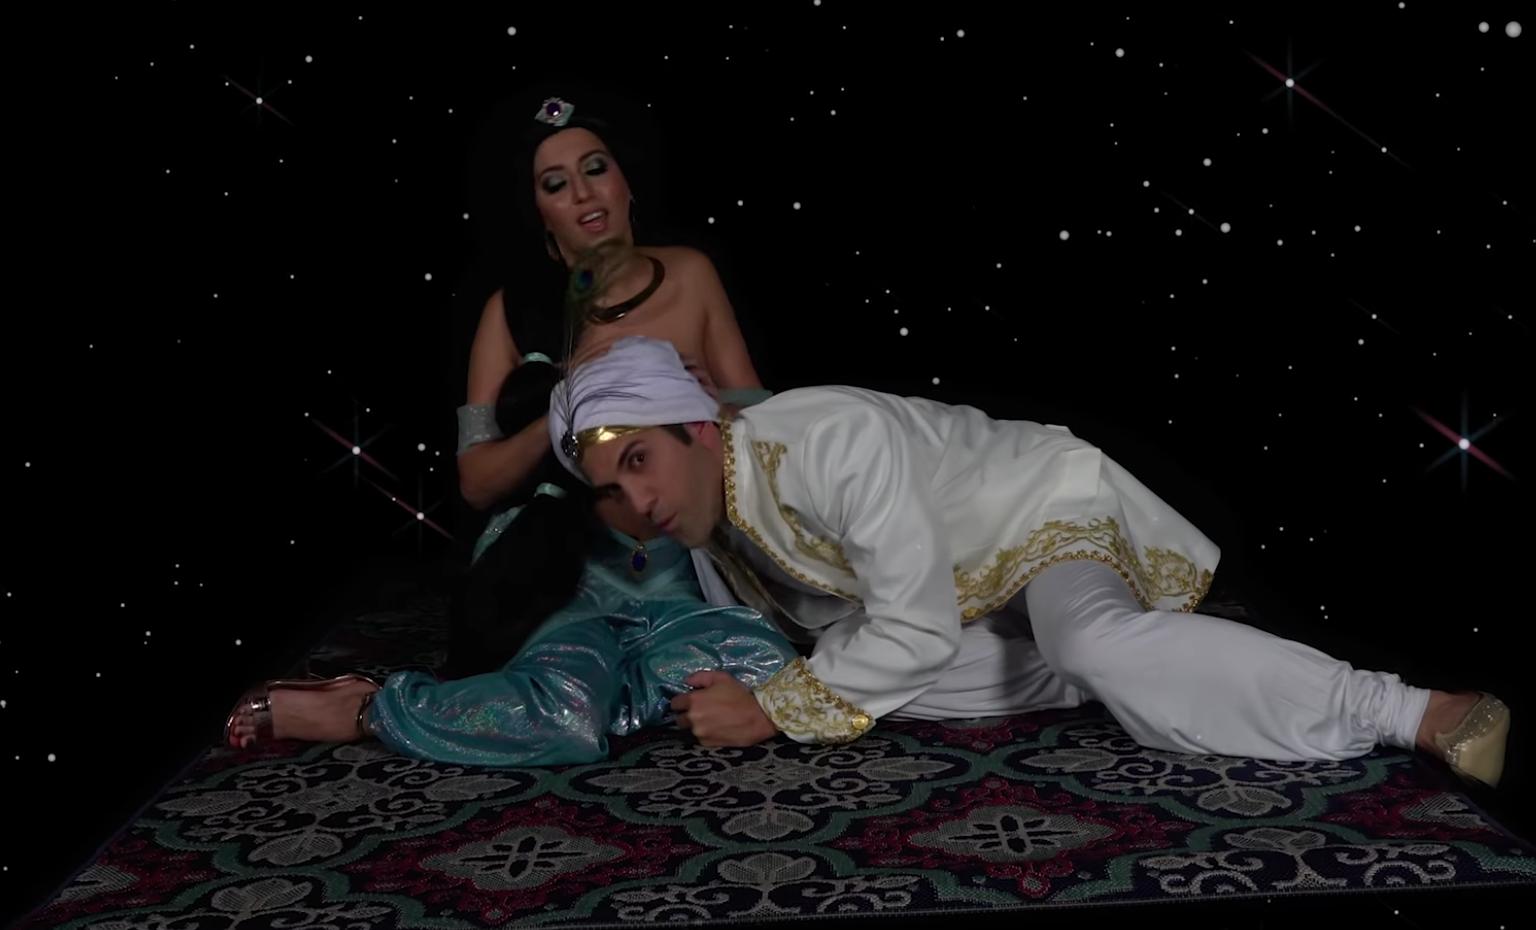 Aladin Porm 'aladdin' gets a timely porn parody